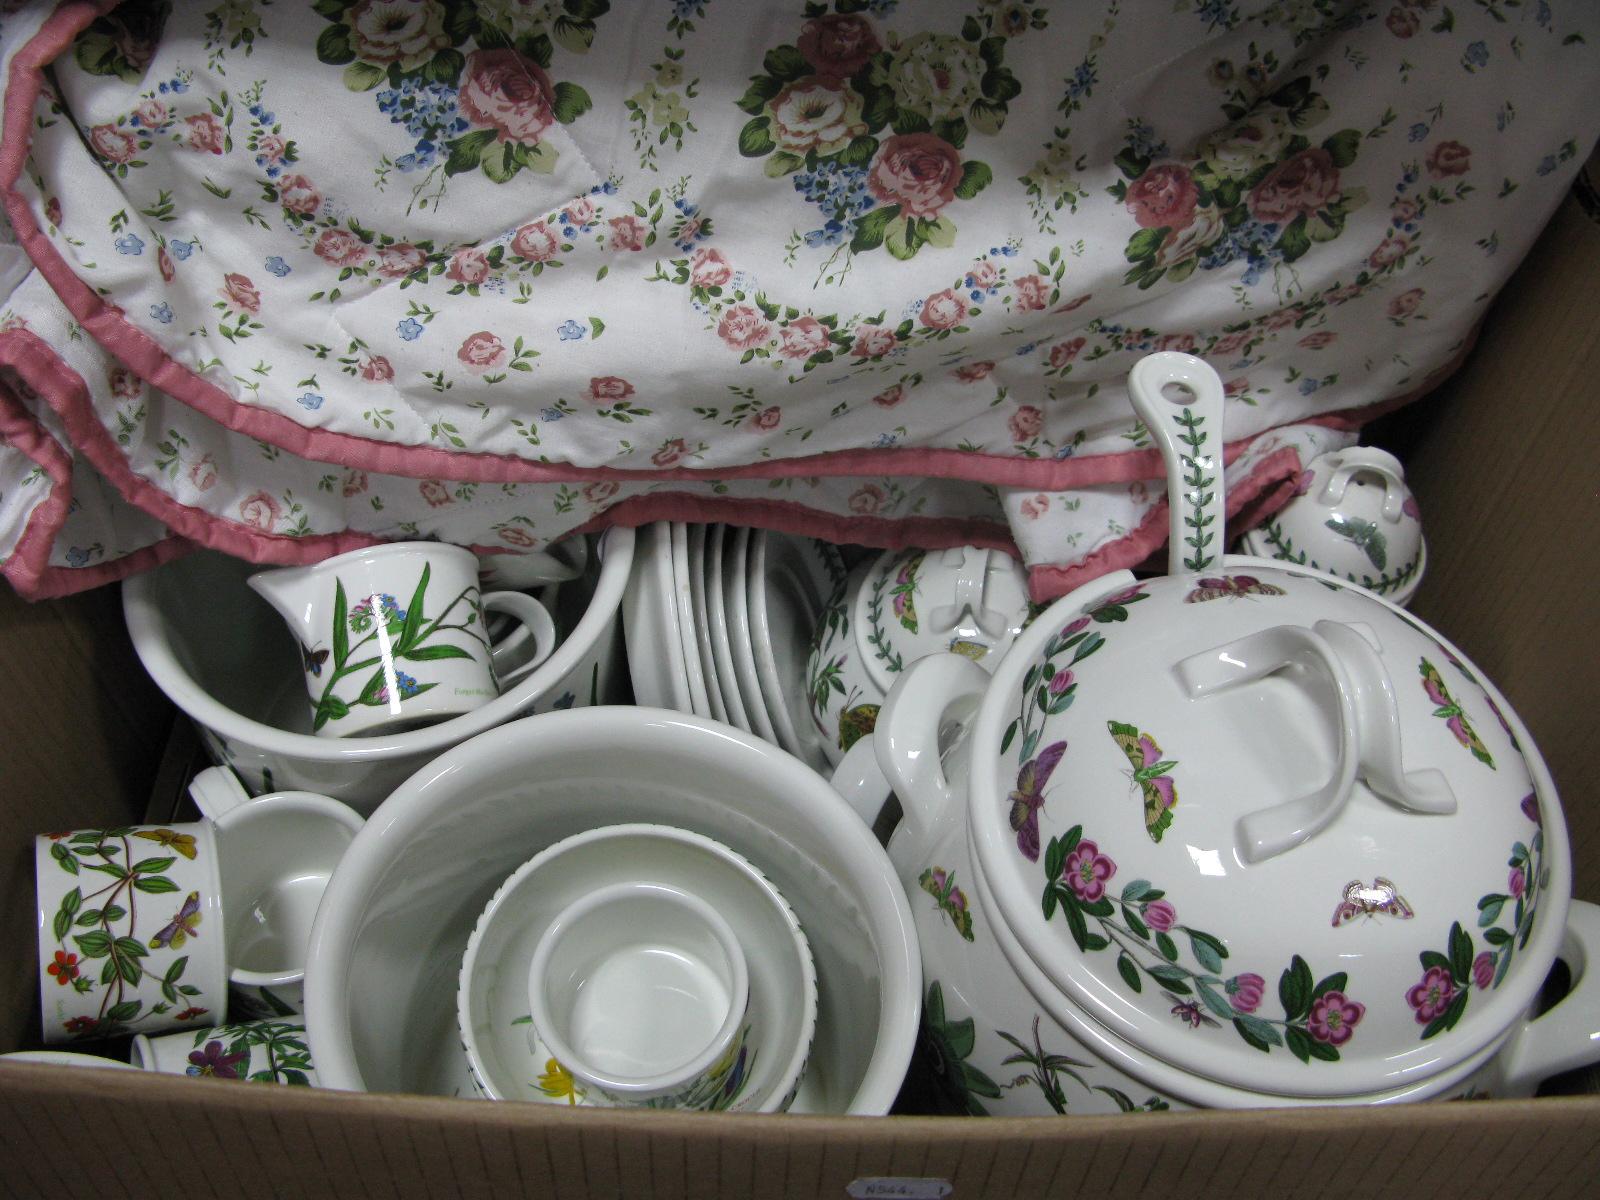 Lot 1041 - Portmeirion 'Botanic Garden' Soup Tureen, ladle, teapot, coffee pot (dam), jardinieres, other